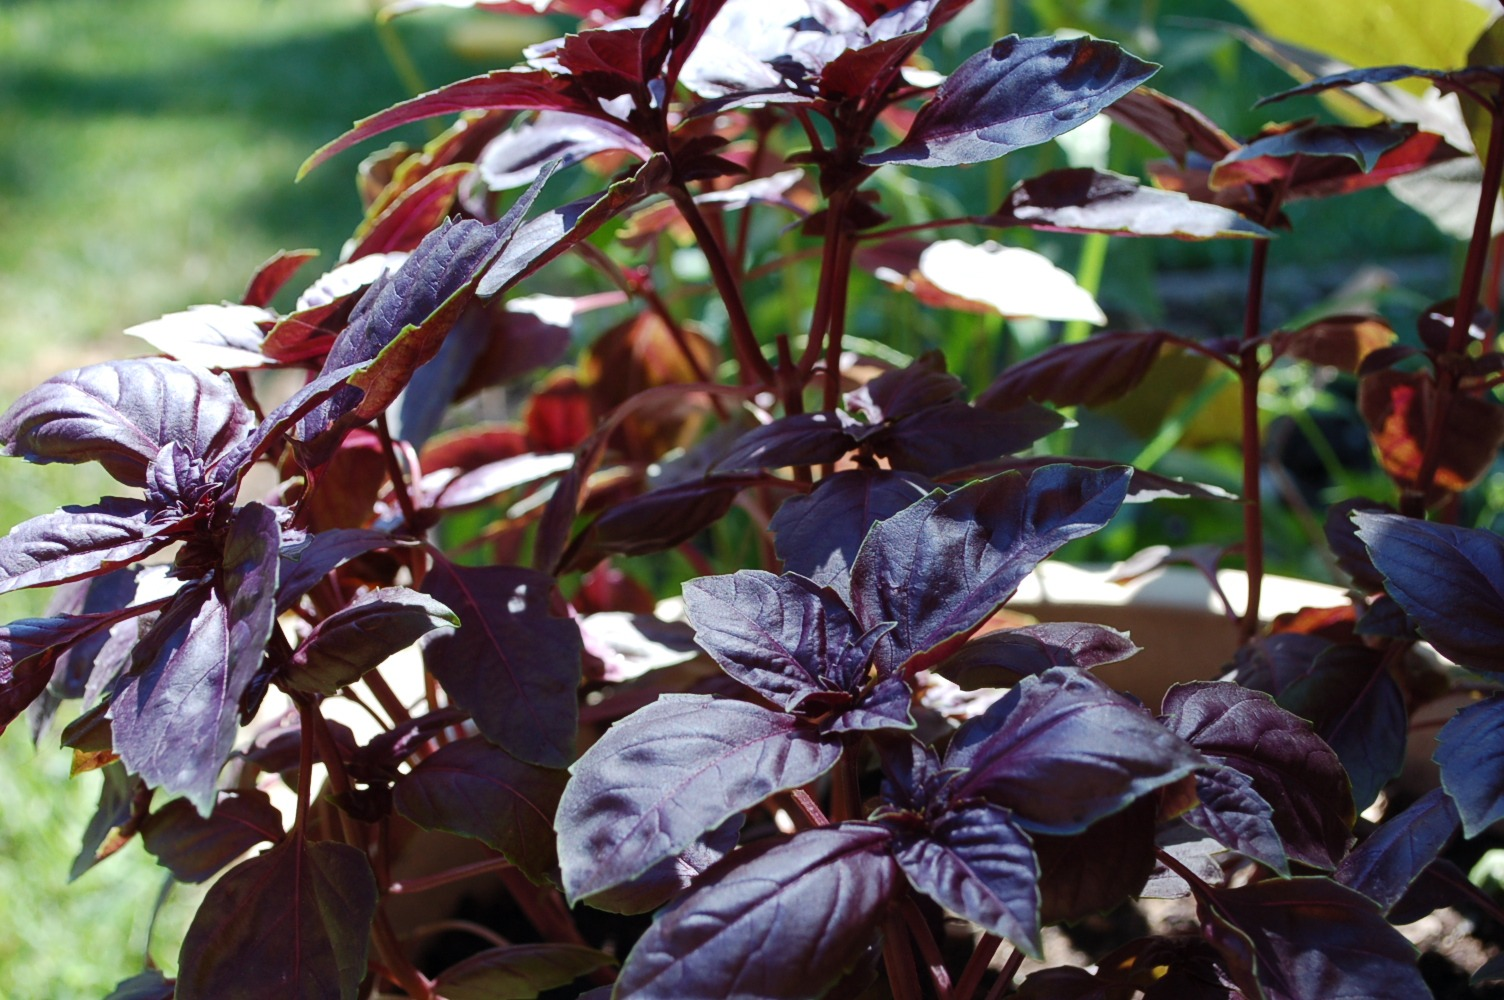 purple basil in an edible garden